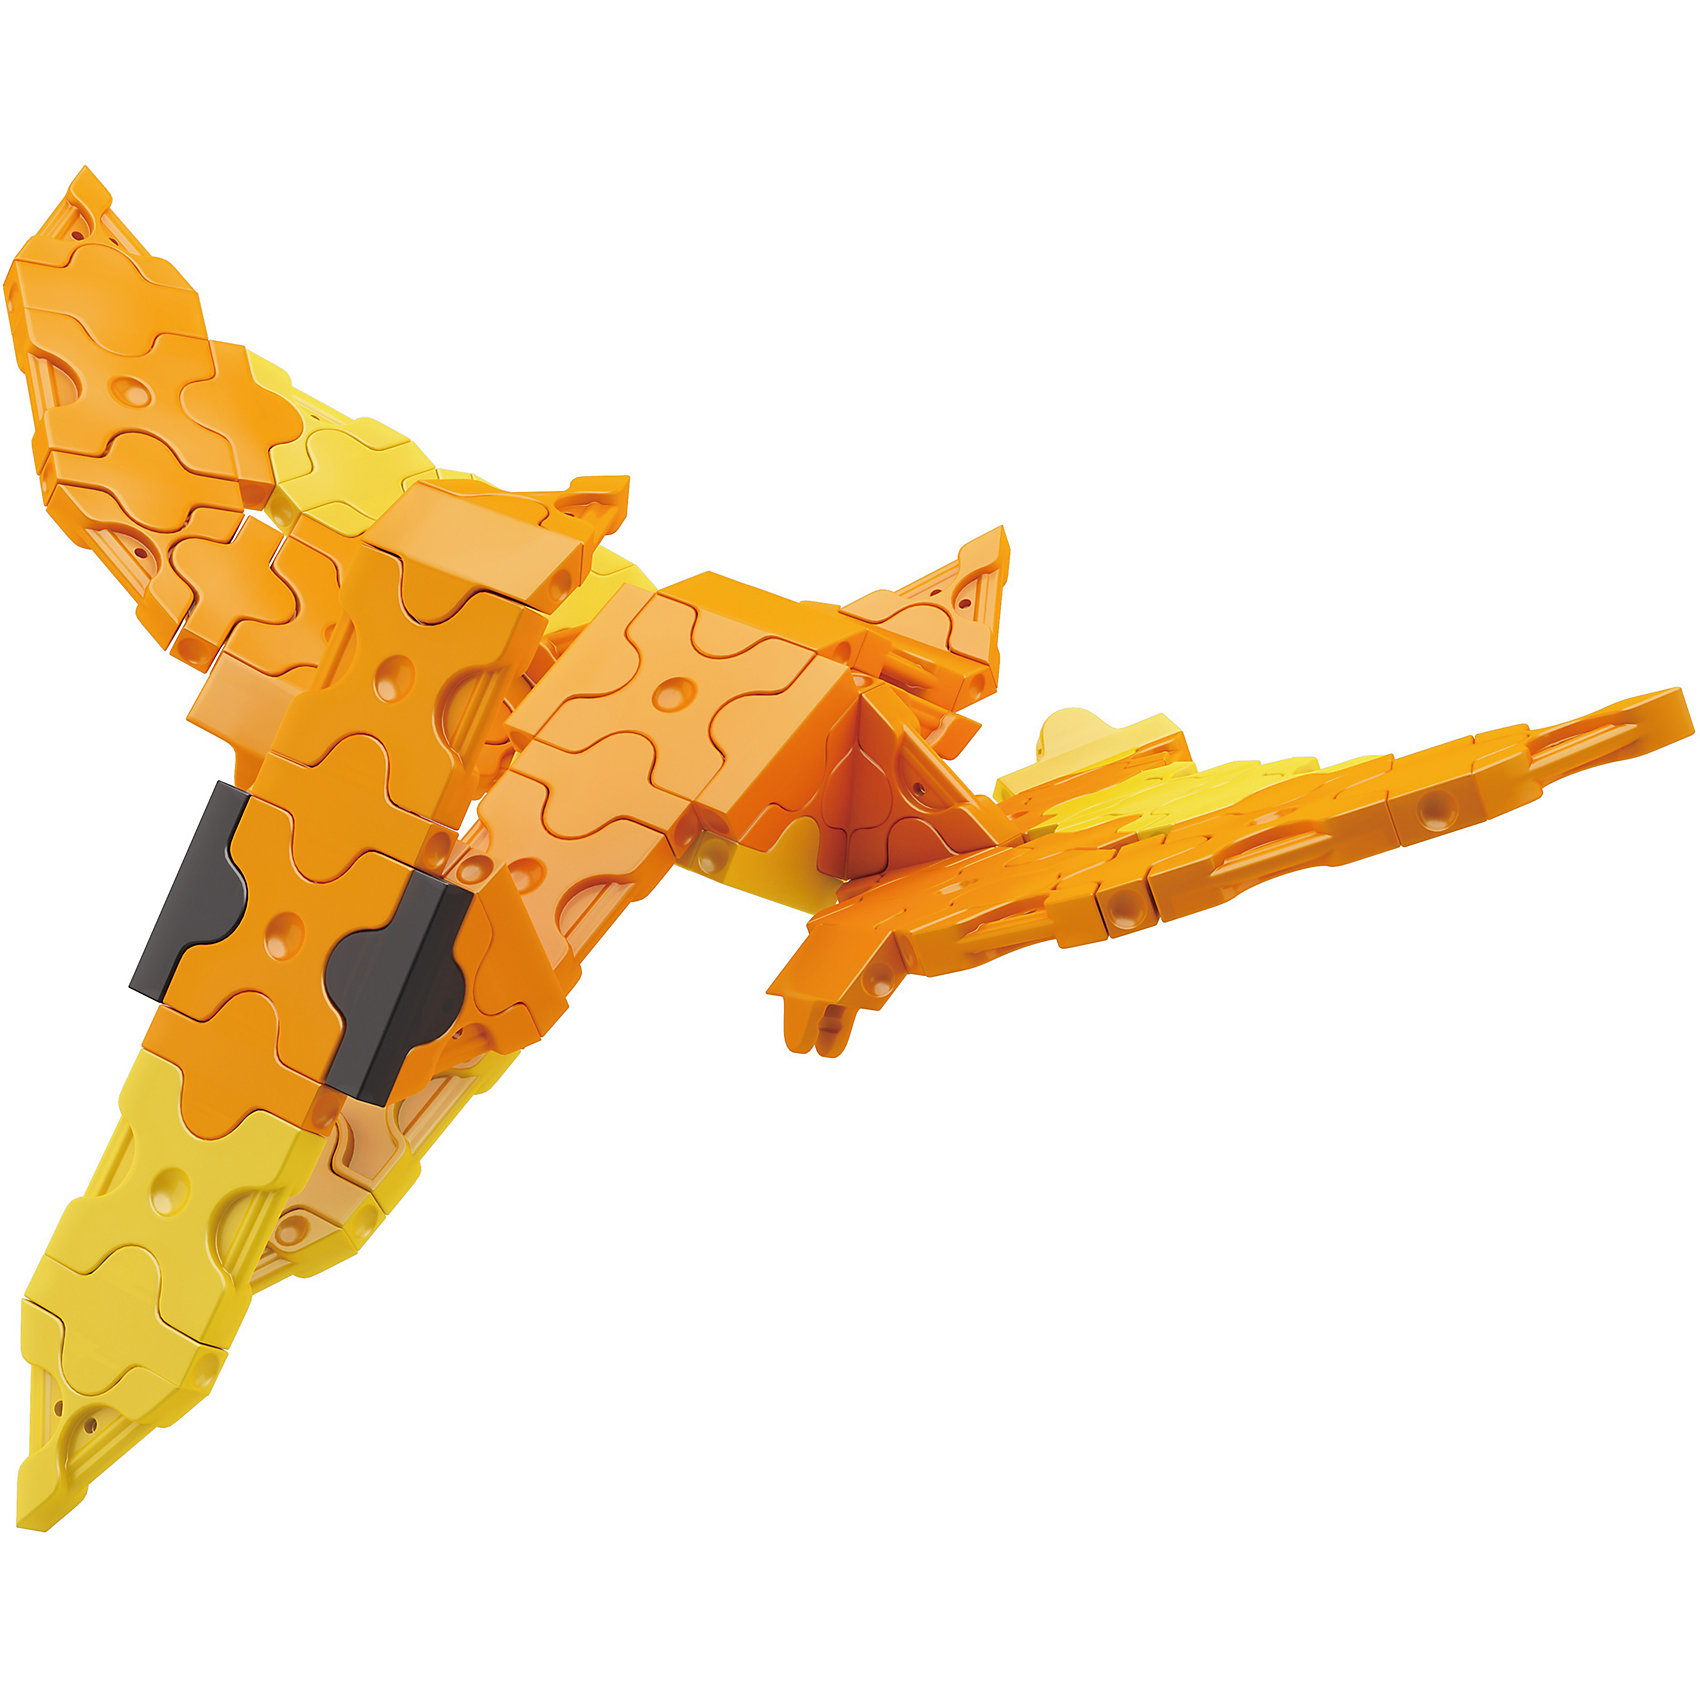 LaQ Конструктор Mini Pteranodon, 88 деталей, LaQ конструктор laq 1818 mini pteranodon